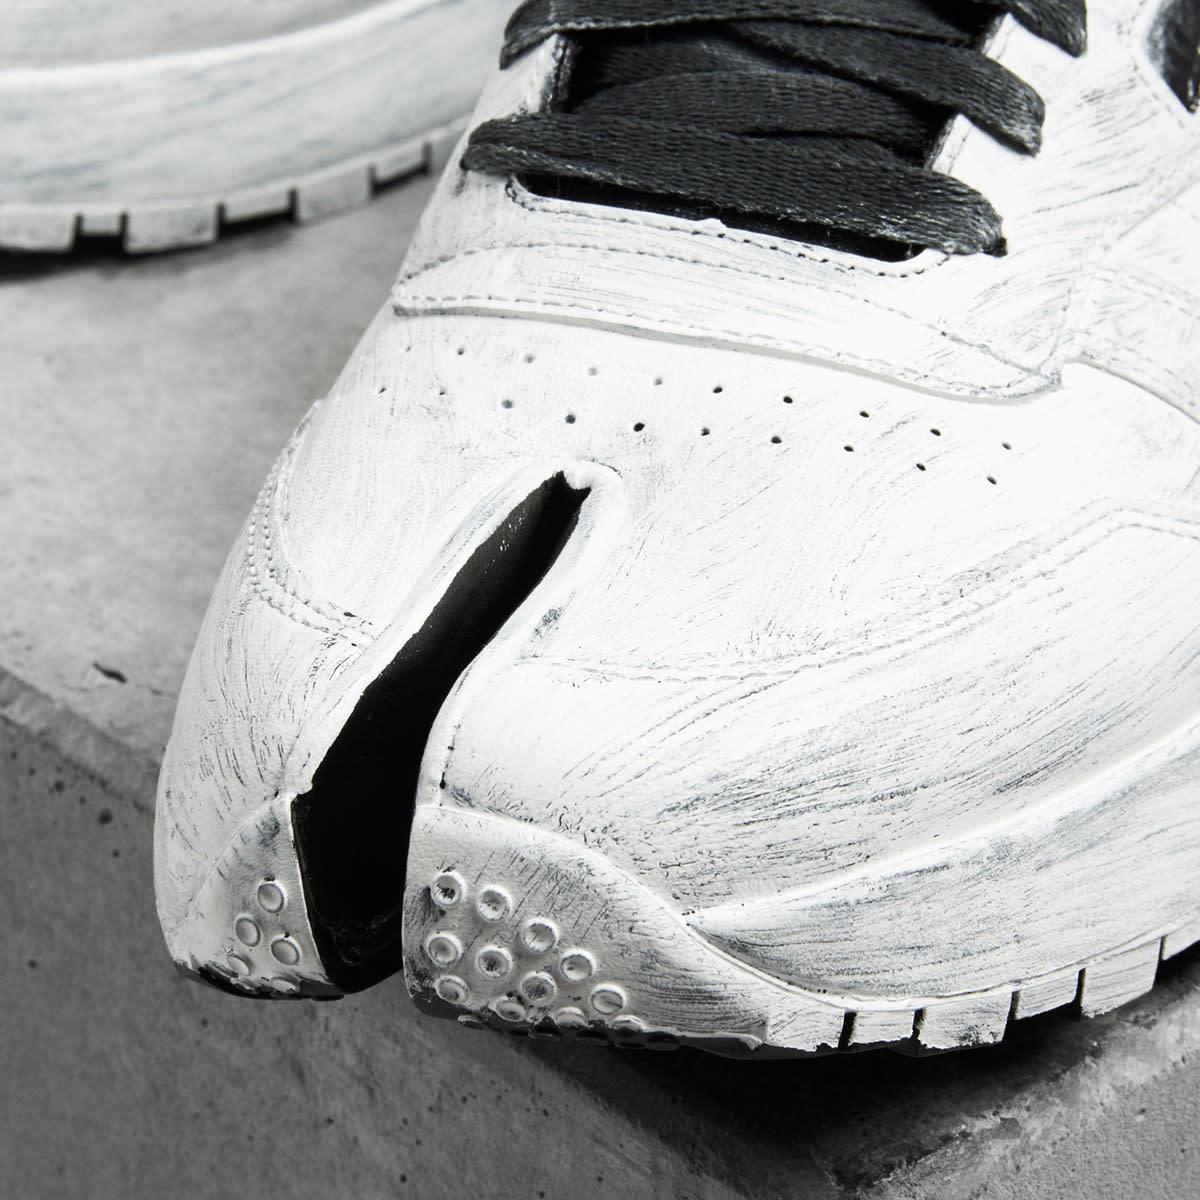 Reebok x Maison Margiela Project 0 Classic Leather Tabi - H04859